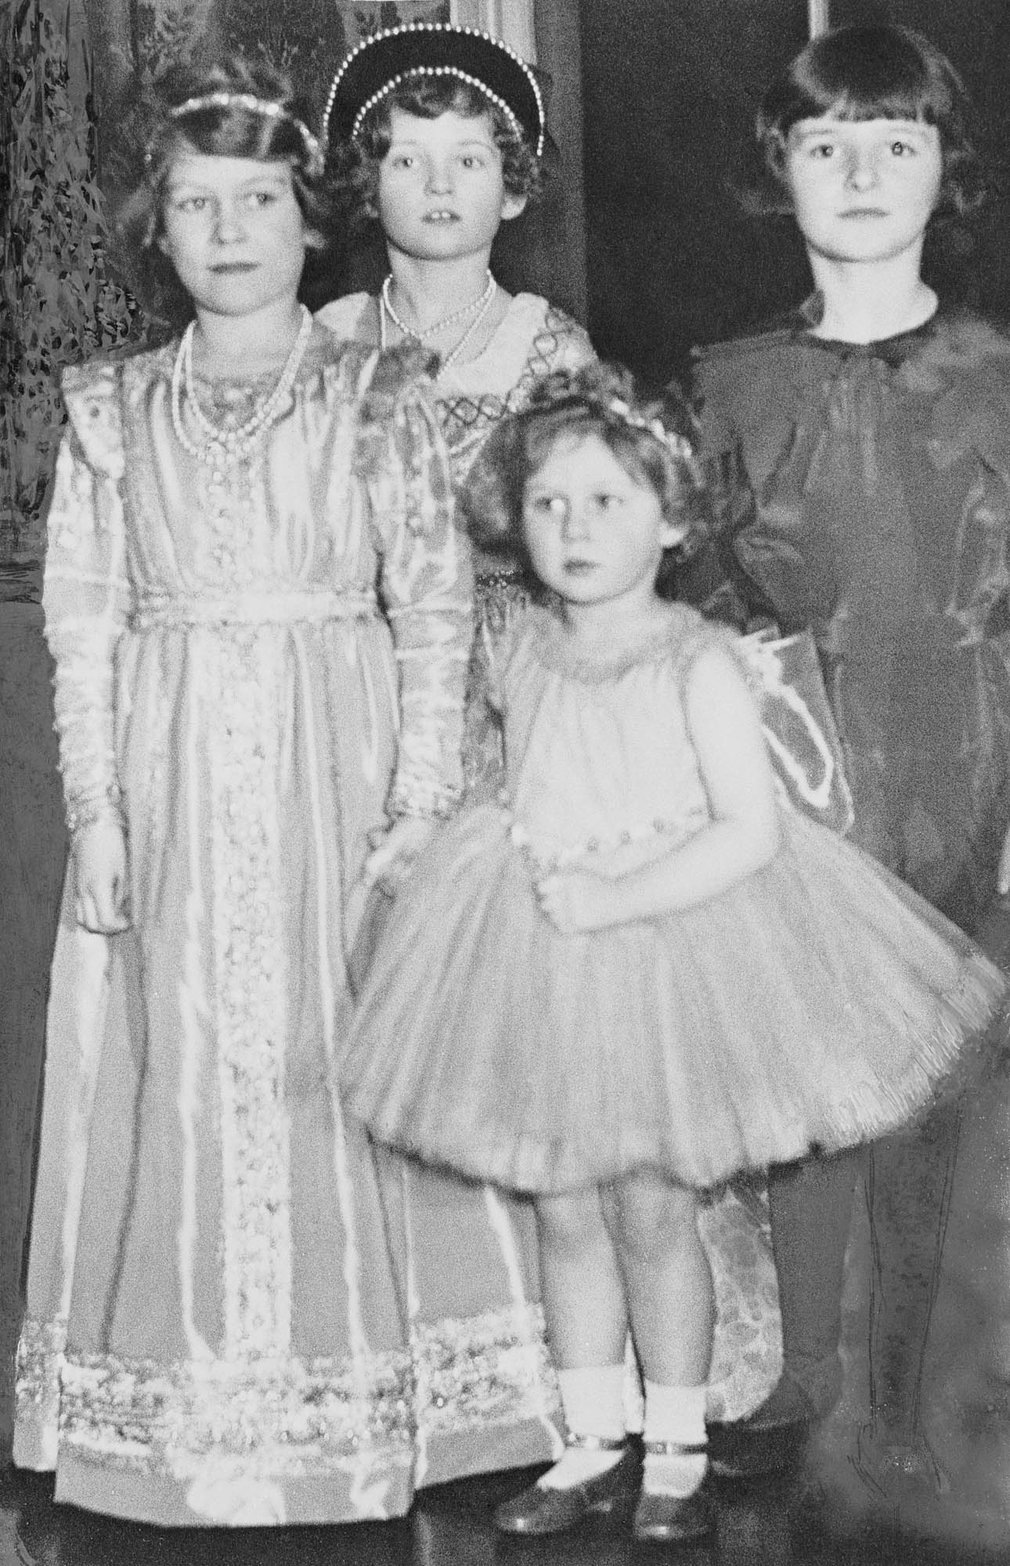 Photograph of Princesses Elizabeth and Margaret of York, c. 1935 (RCIN 2108323)